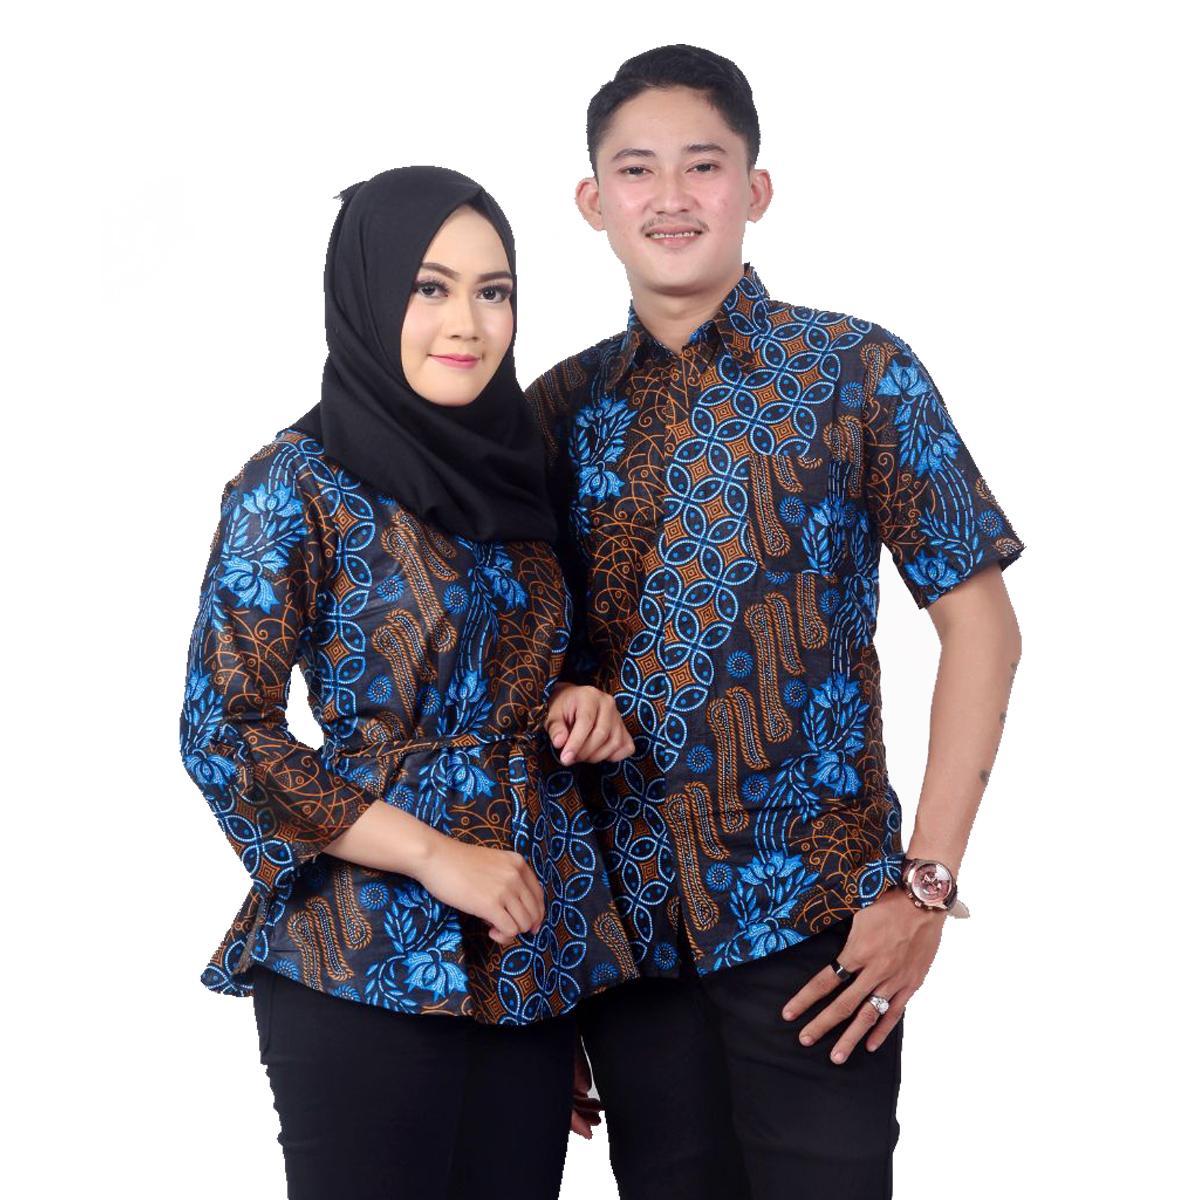 Baju Batik Couple / Couple Batik / Baju Muslim Wanita Terbaru 2019 / Batik Sarimbit / Baju Batik Modern / Batik Kondangan / Batik Keluarga / Batik Pekalongan Seno Nuklir